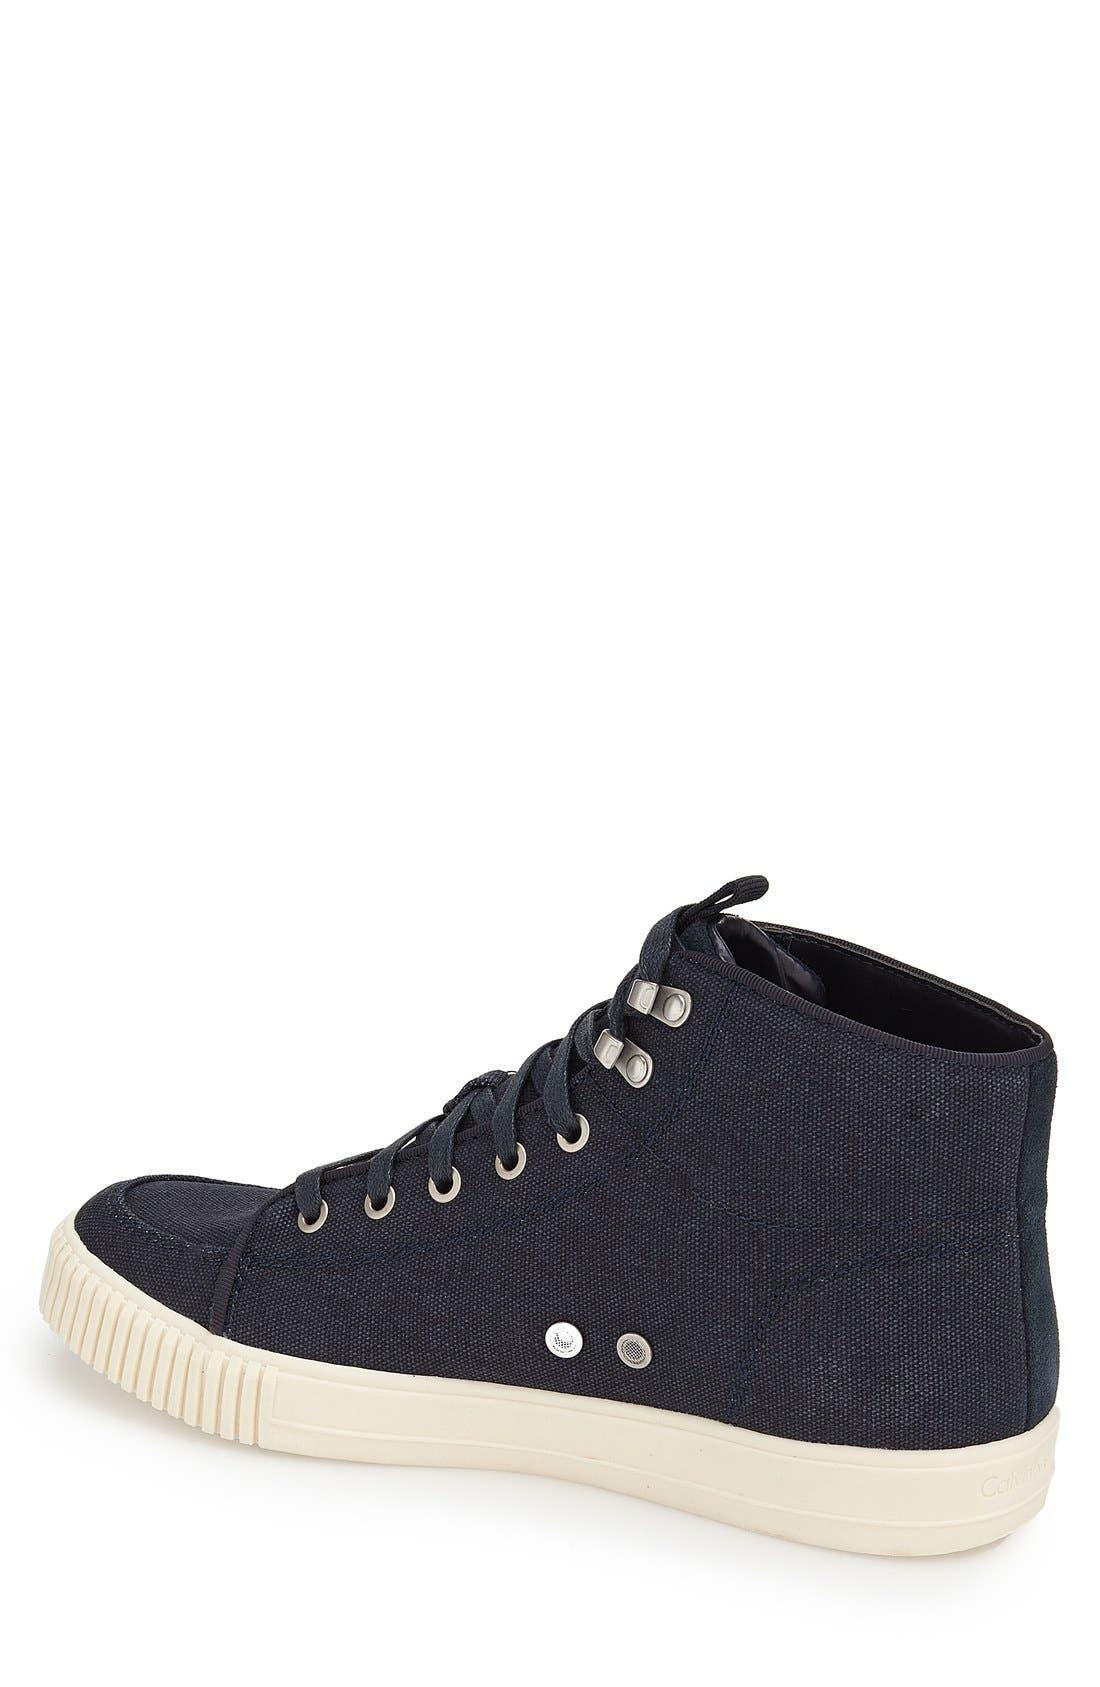 Alternate Image 2  - Calvin Klein Jeans 'Jenson' Sneaker (Men)